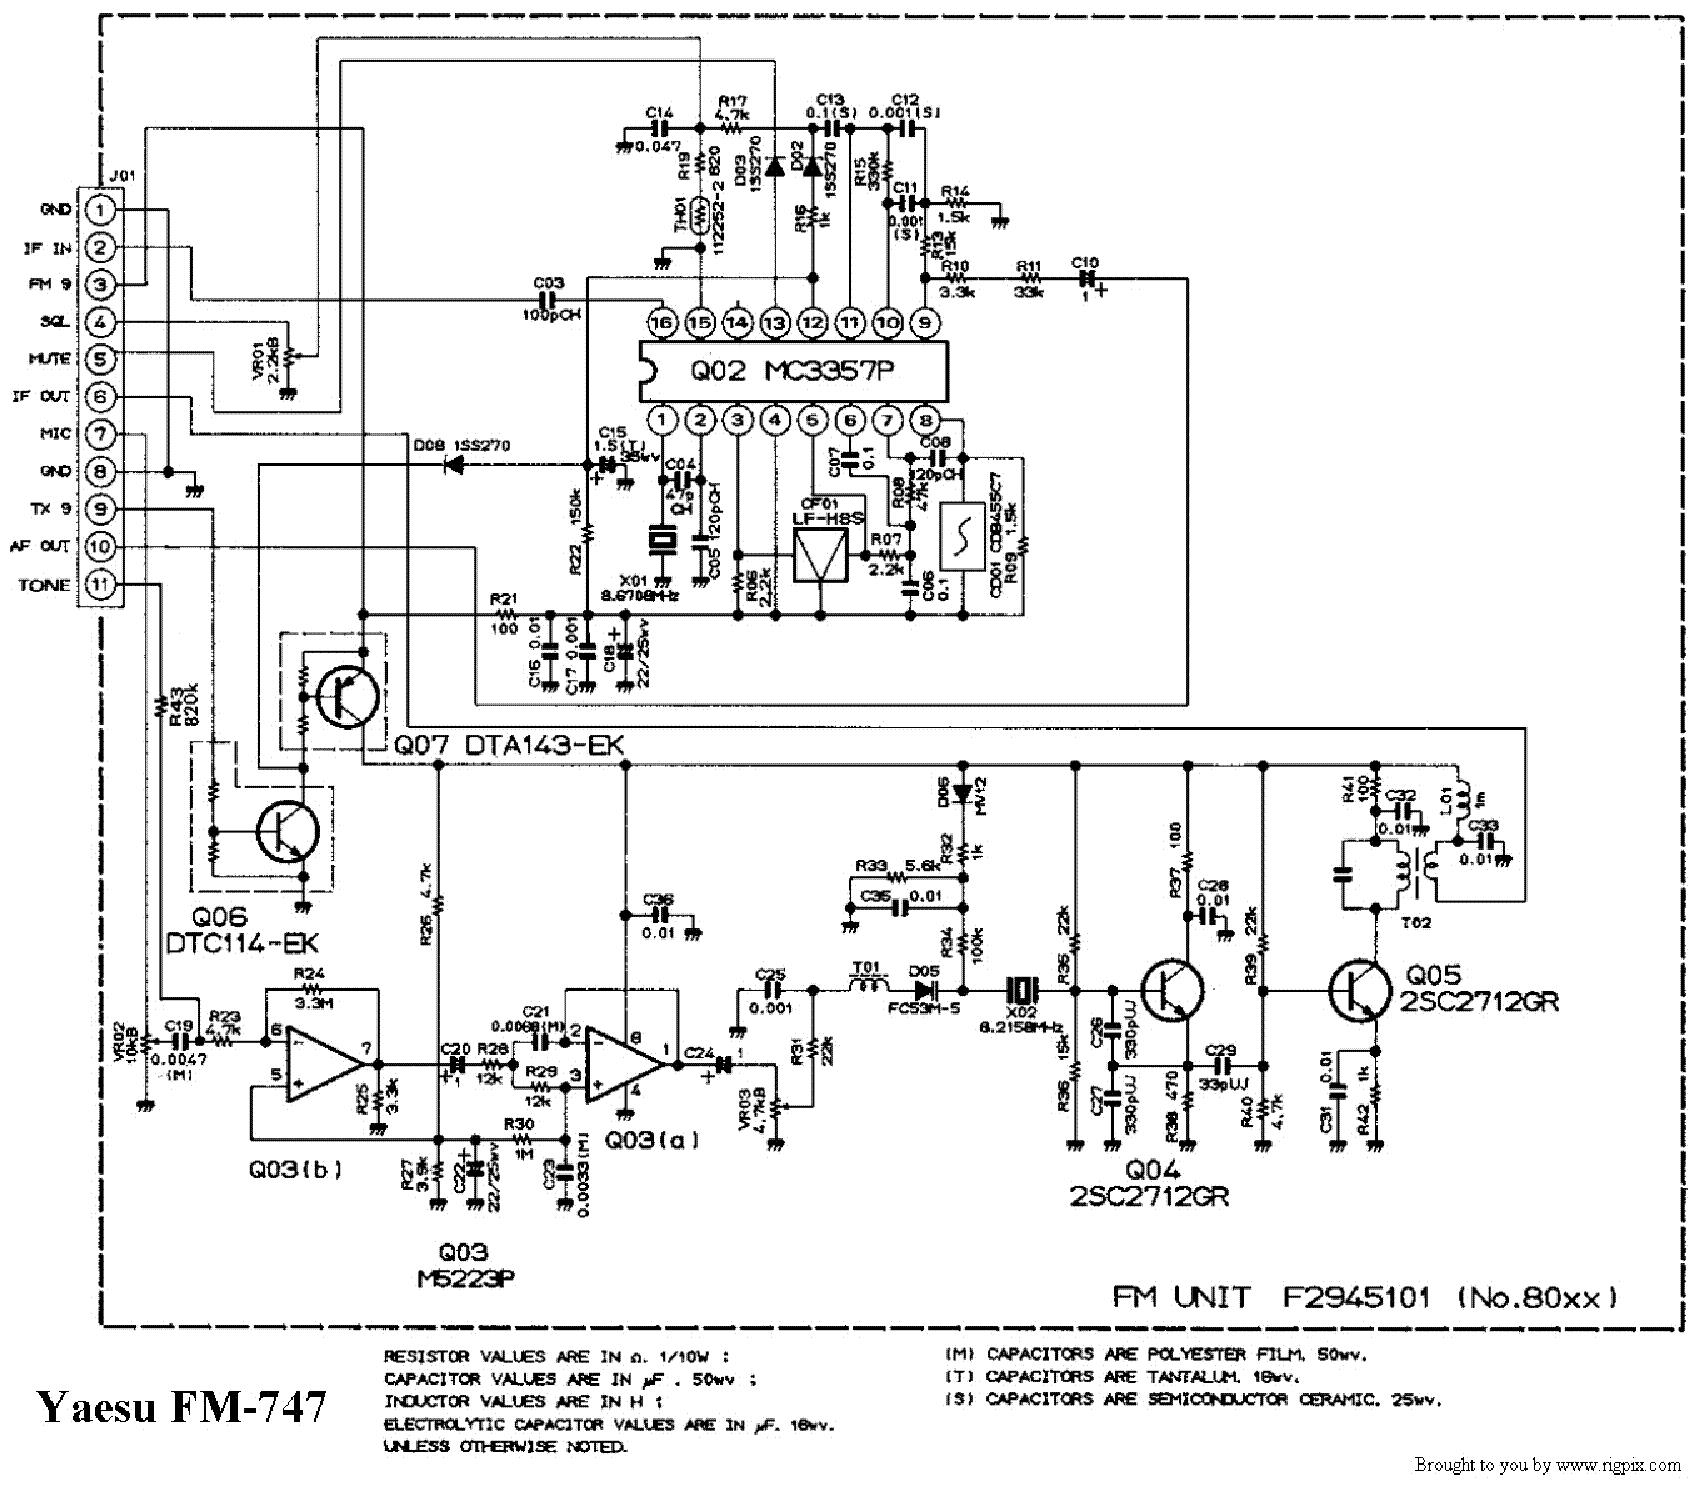 yaesu ft 8800r manual pdf